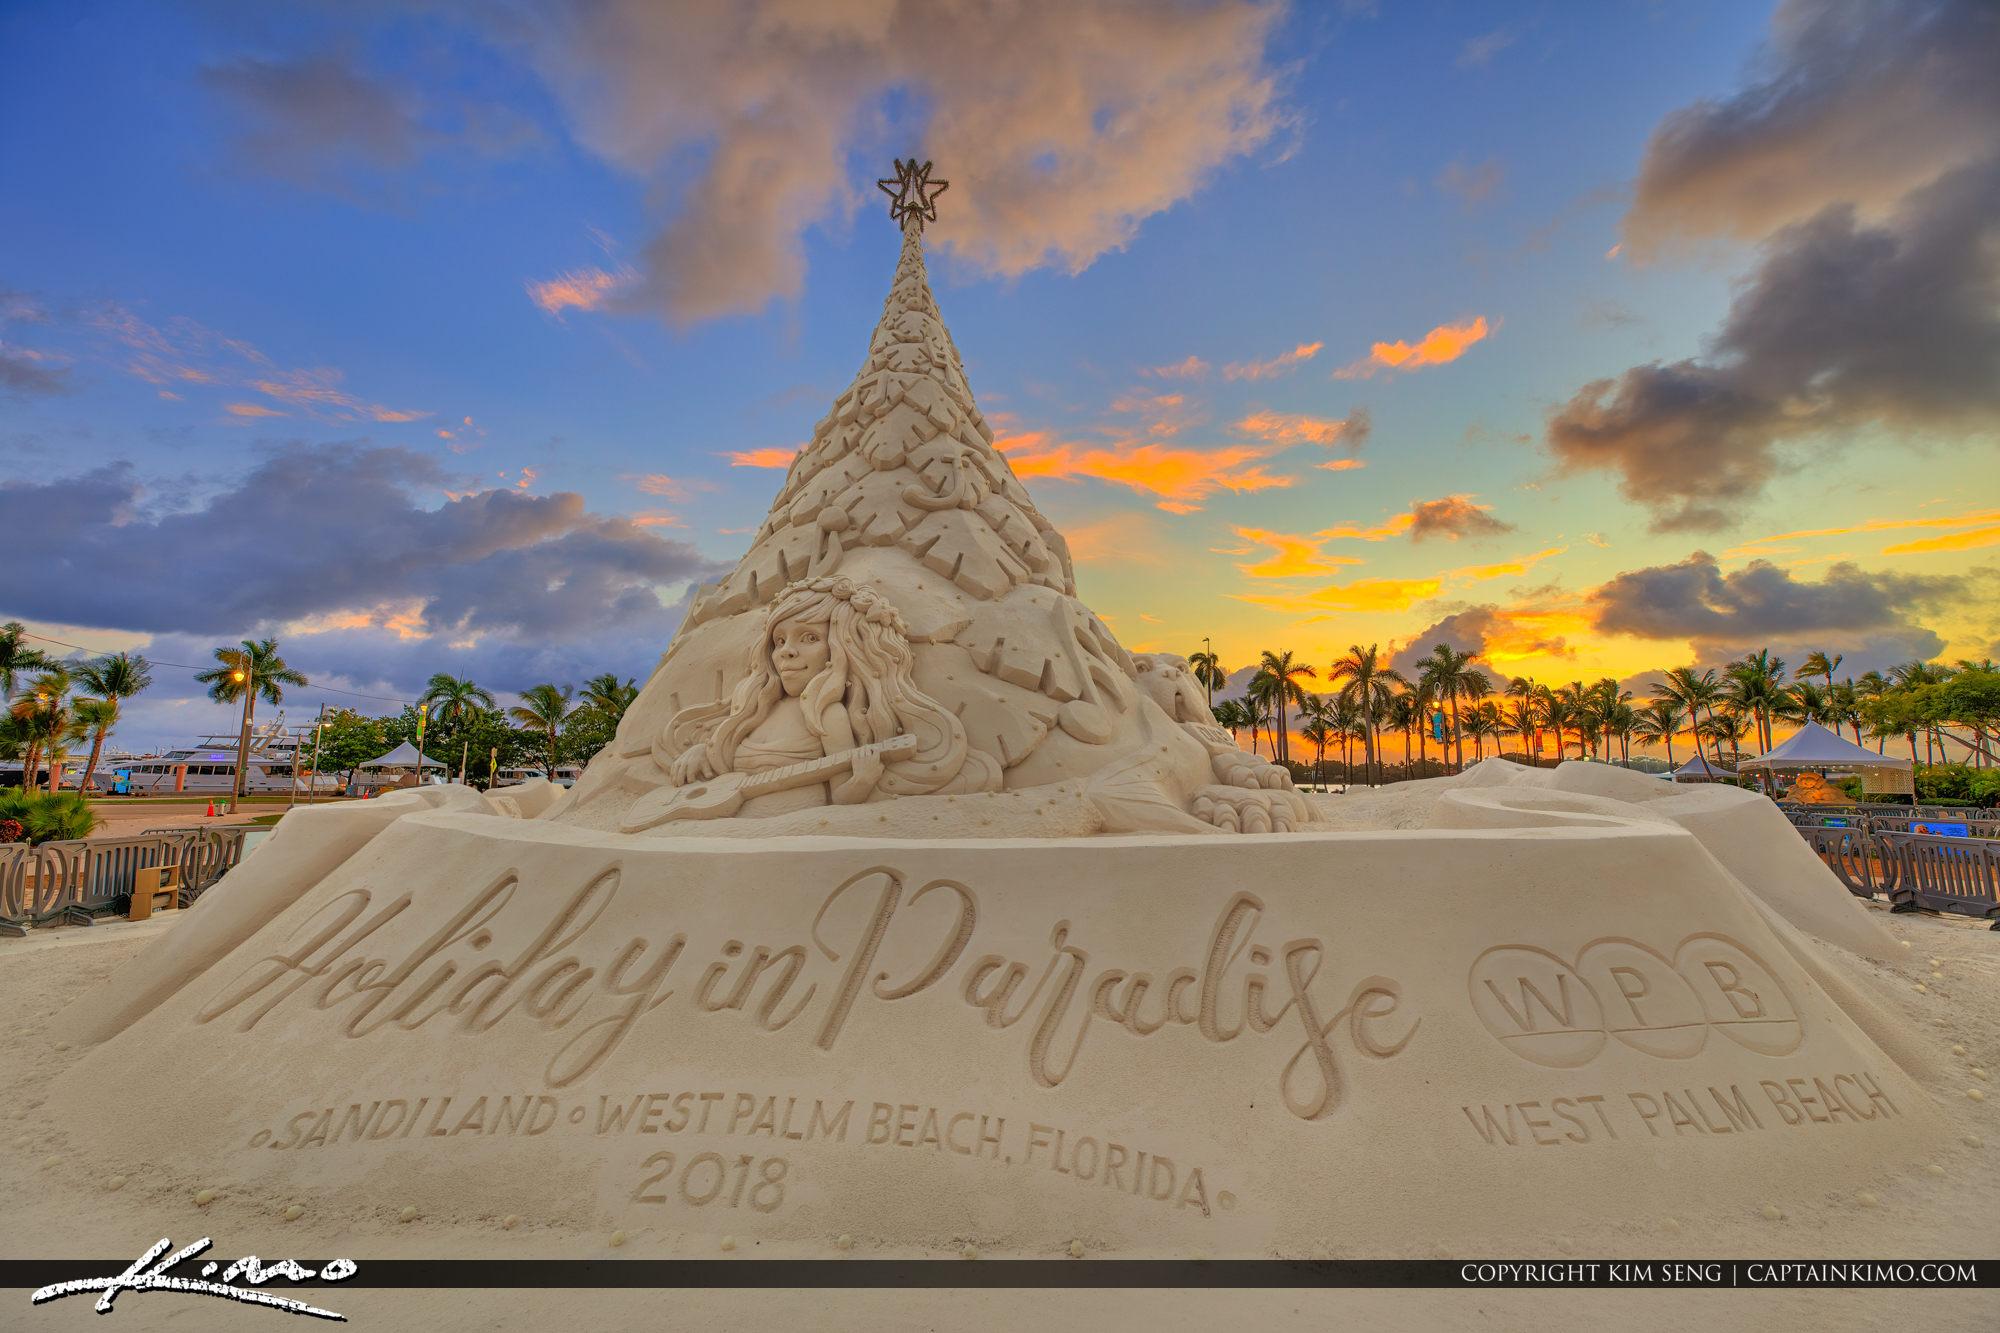 Sandiland West Palm Beach Florida Christmas Tree Downtown 2018